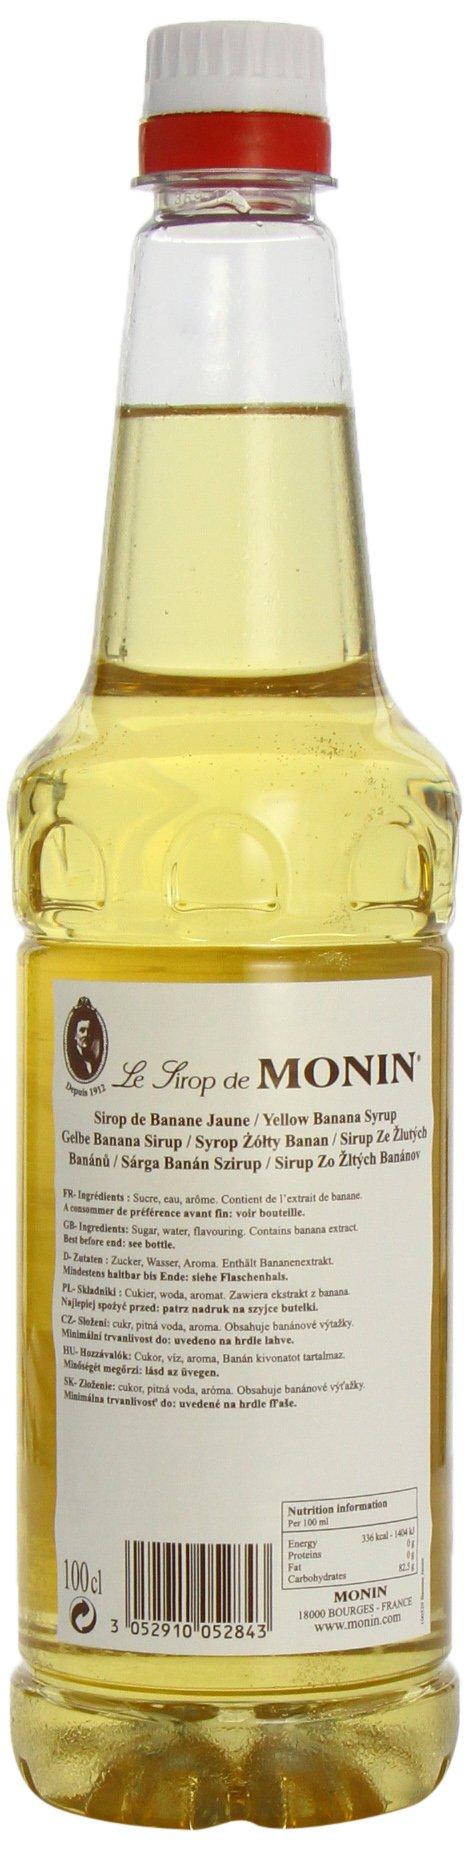 Monin-Premium-Yellow-Banana-Syrup-1-L